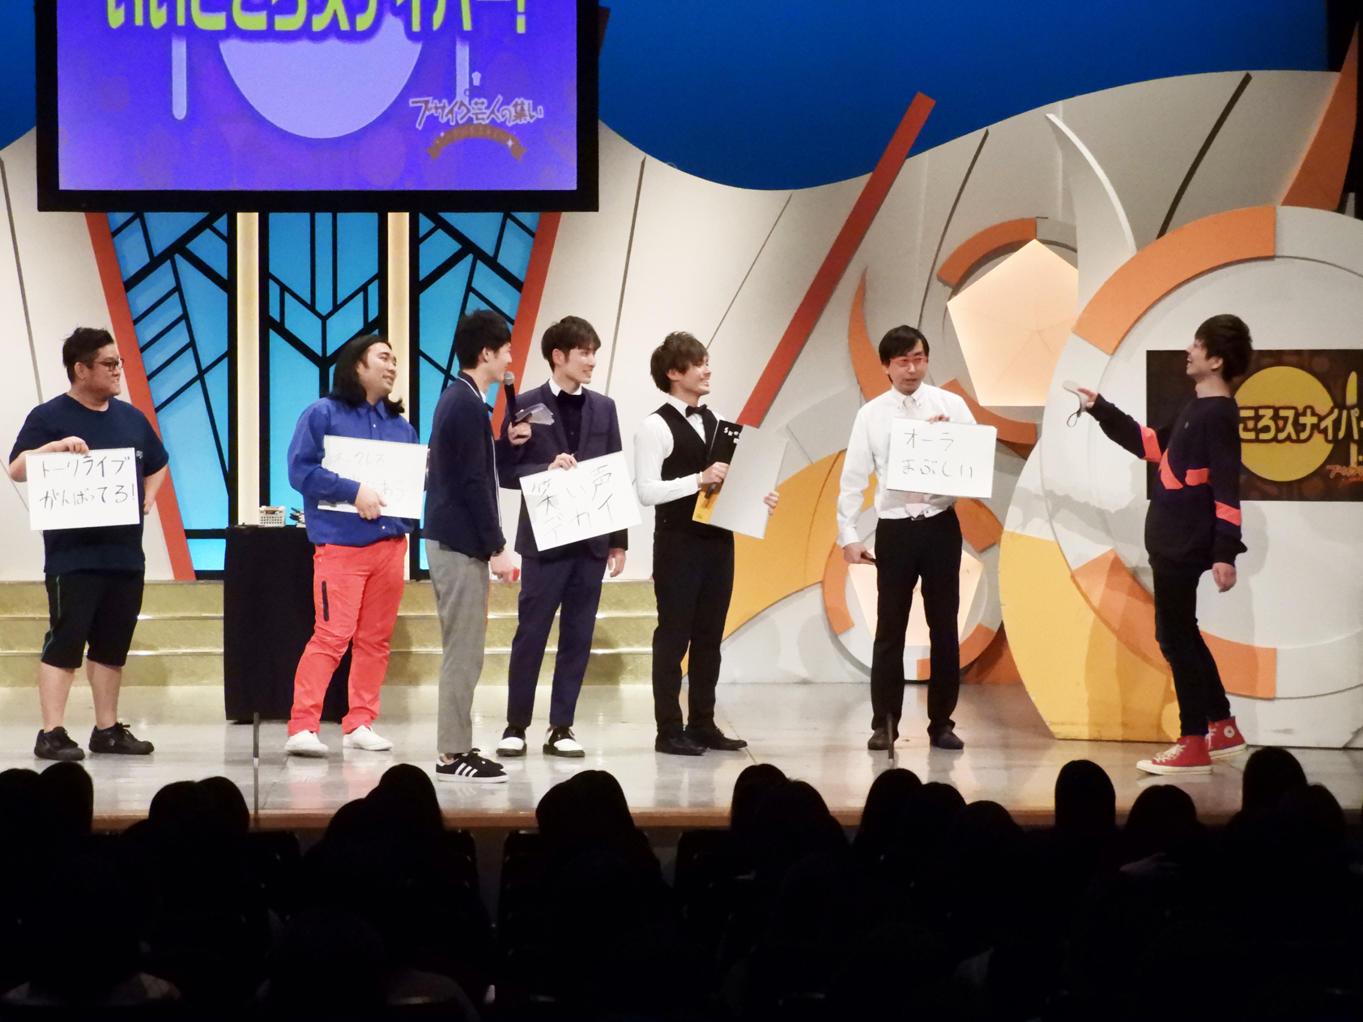 http://news.yoshimoto.co.jp/20180208181715-2ccaf6b371c109963895ddfe805c8da8de707622.jpg